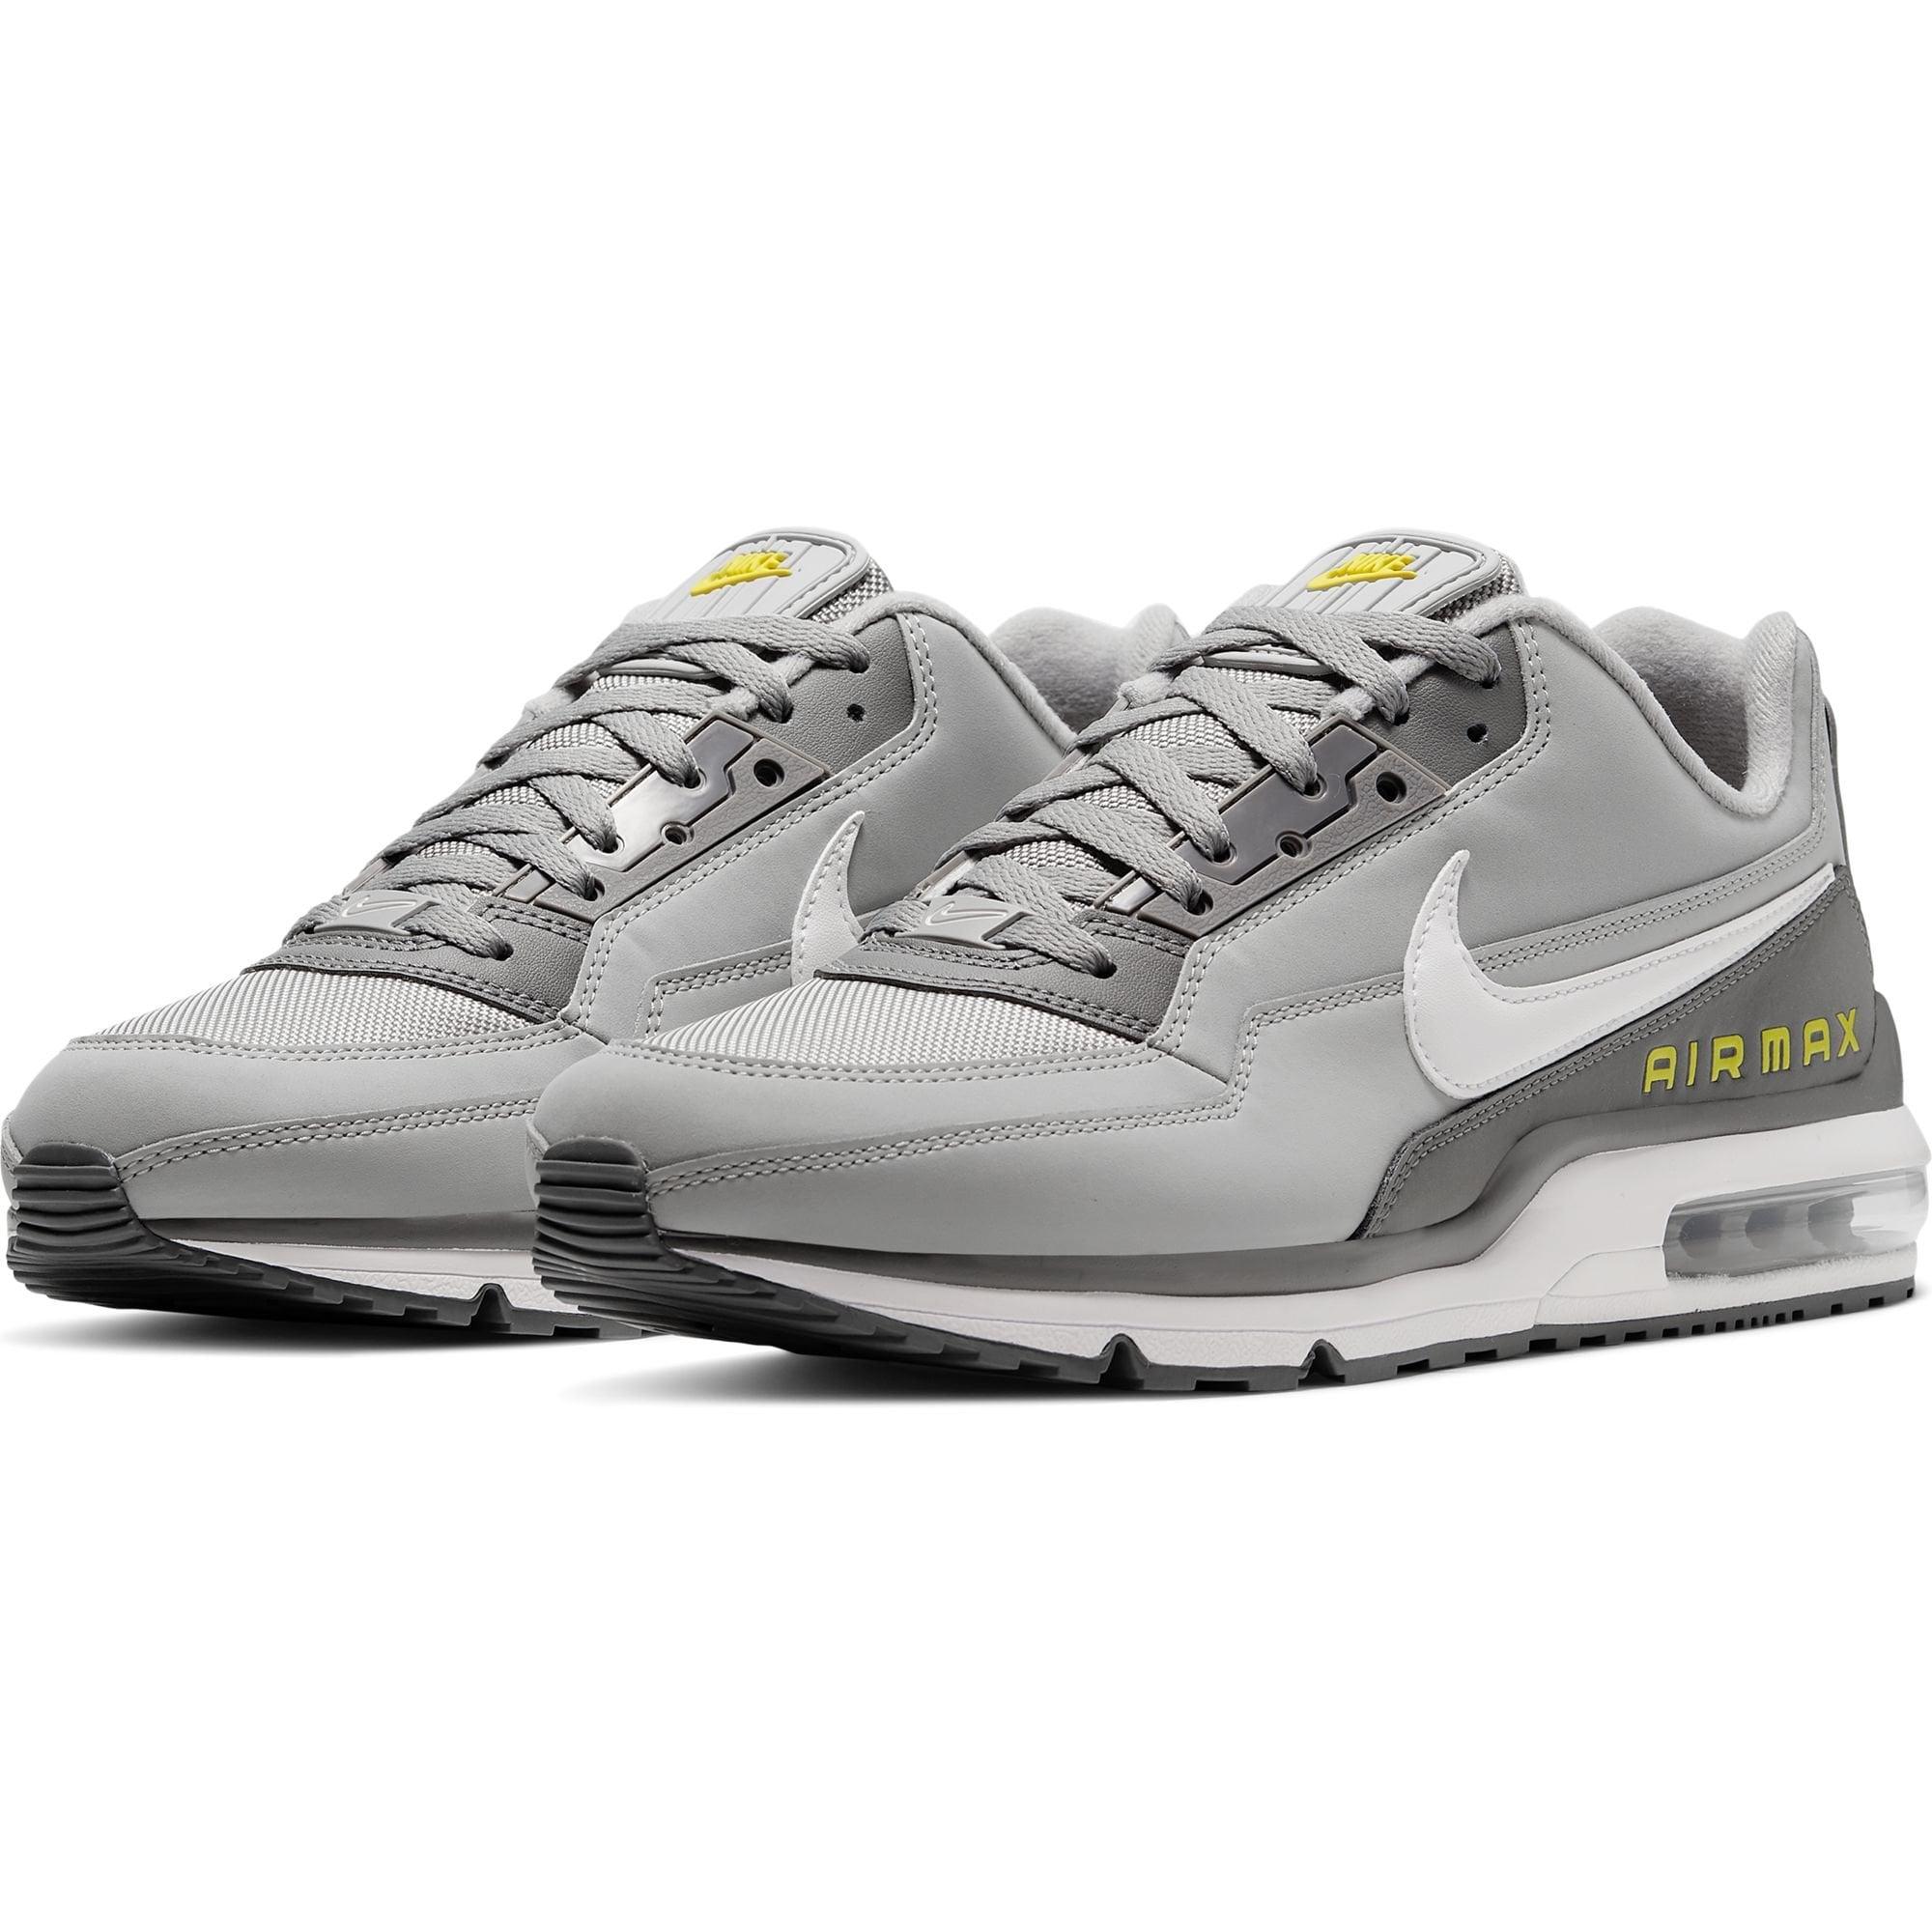 nike air max ltd grey buy clothes shoes